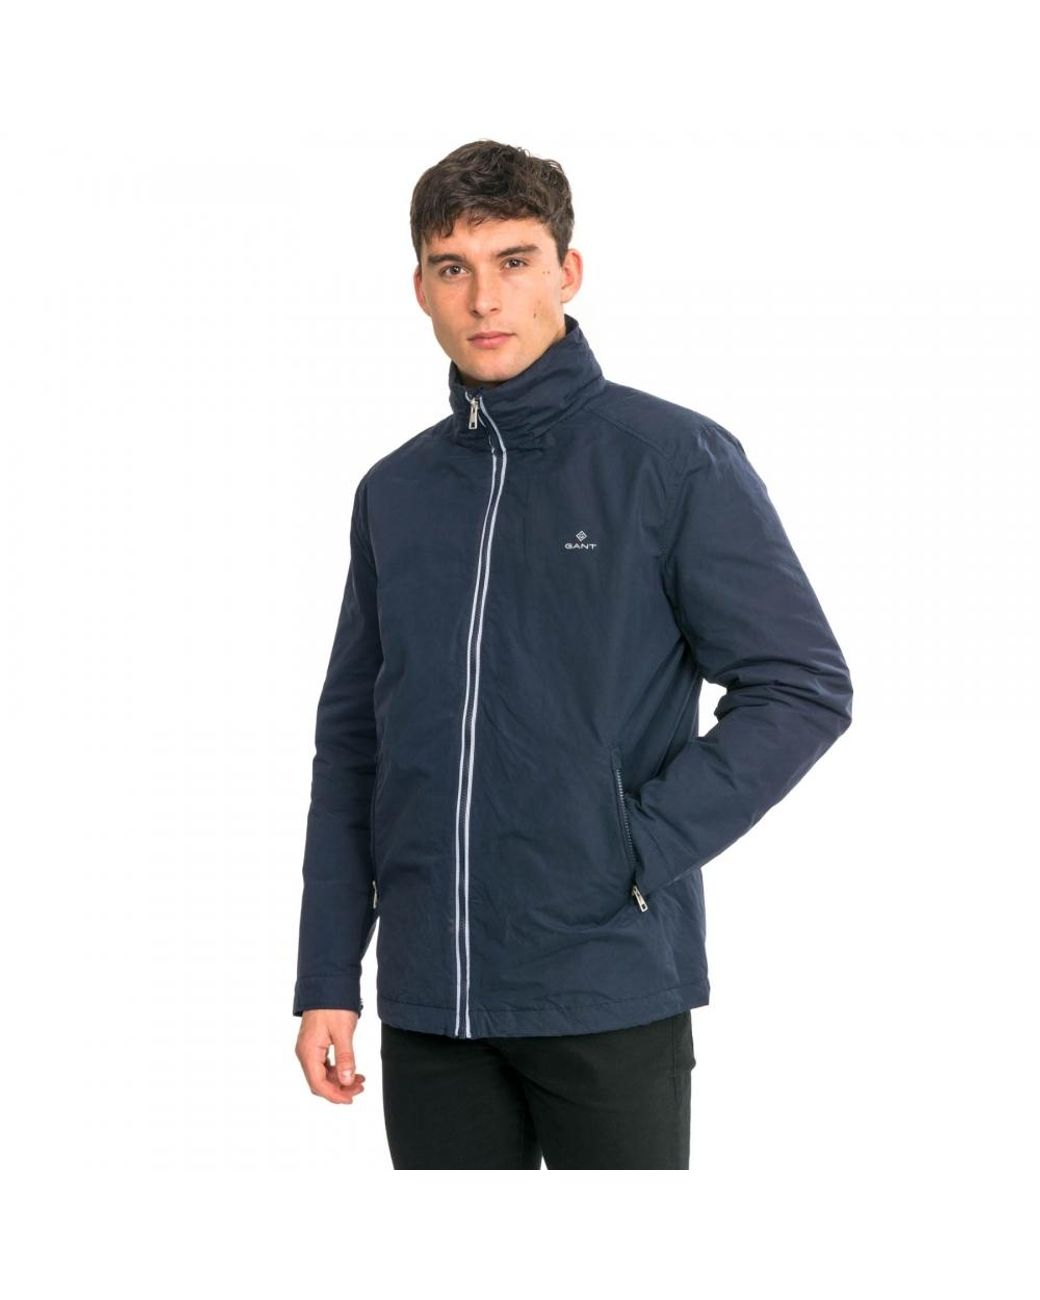 GANT Classic Blue Windbreaker Jacket